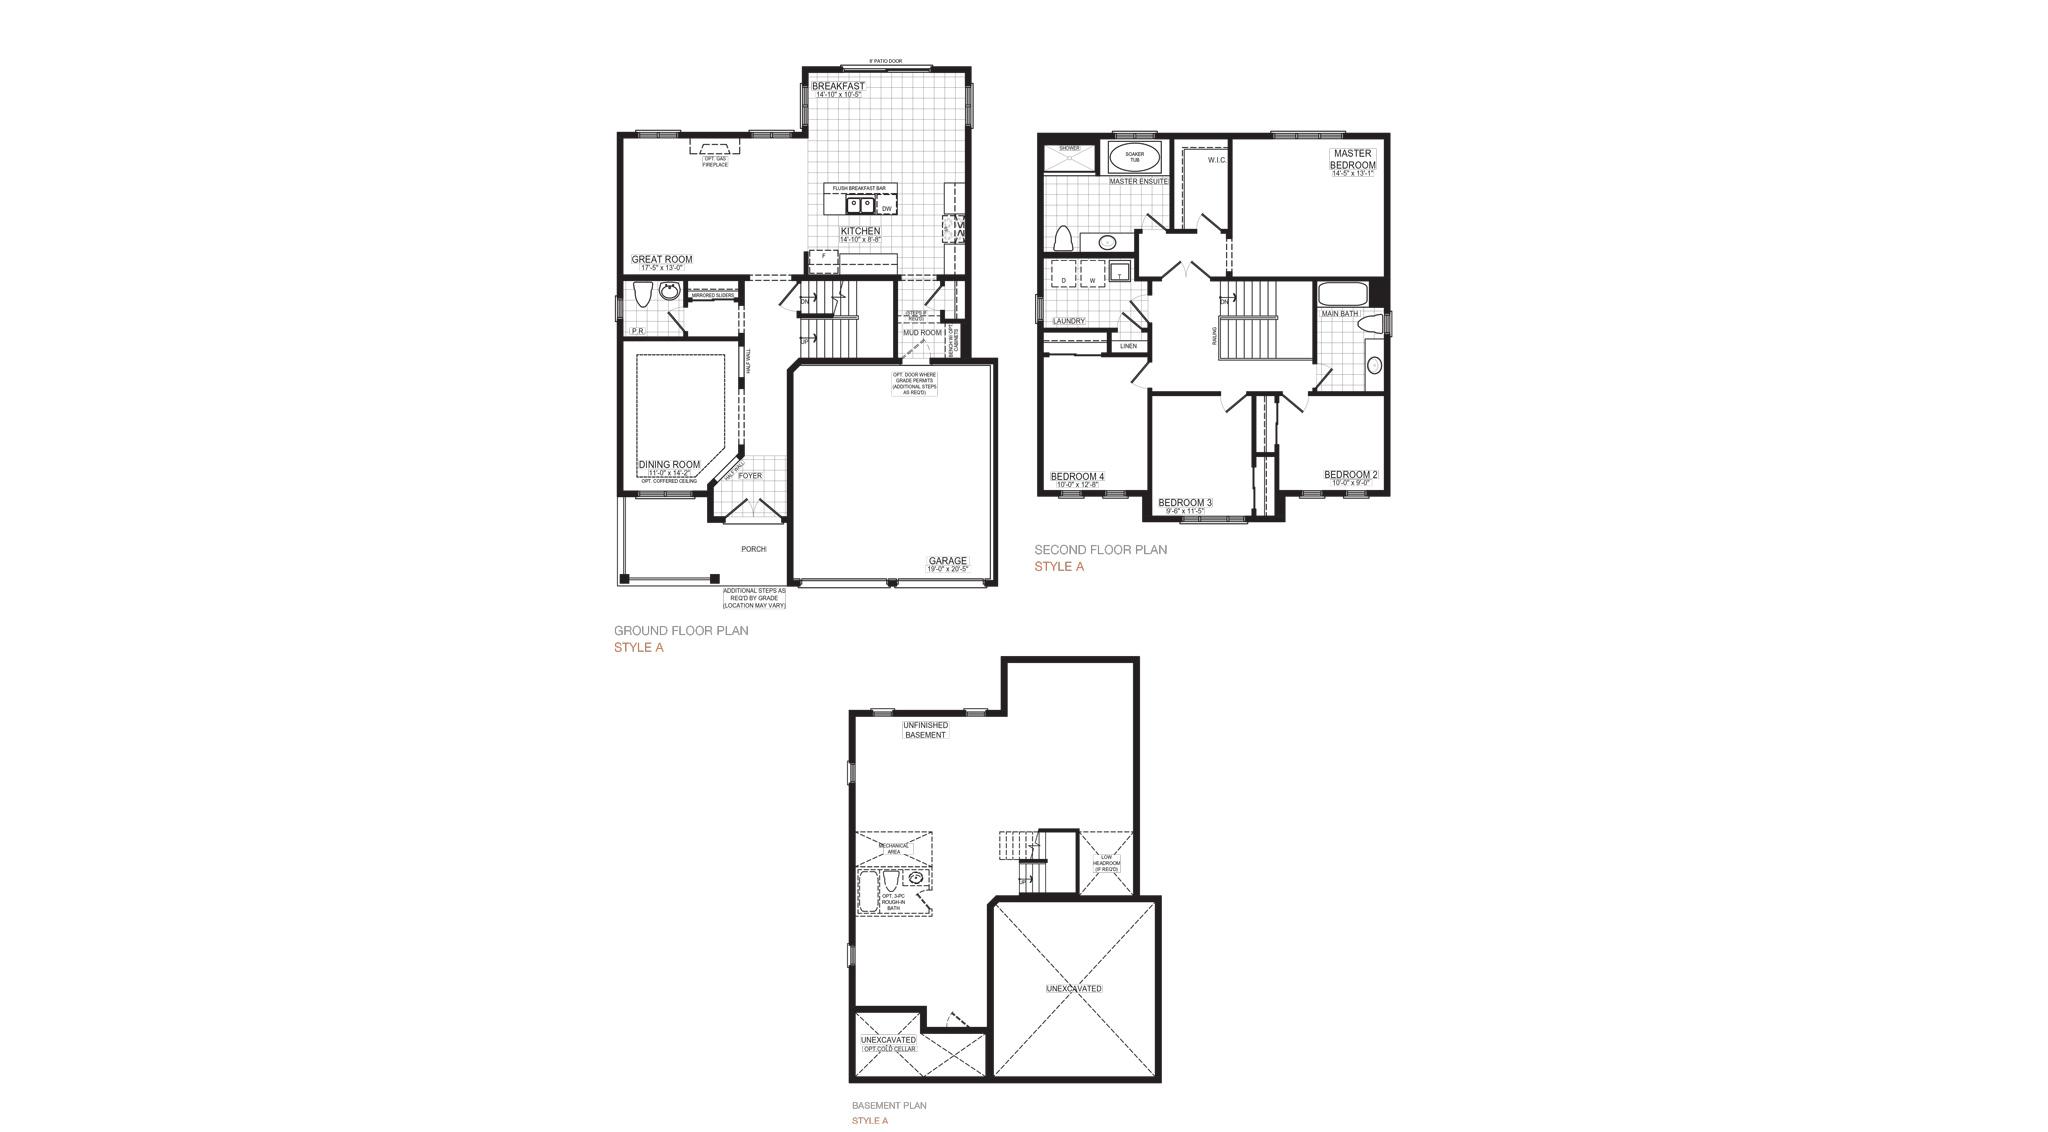 35872-fantasia-floor-plan